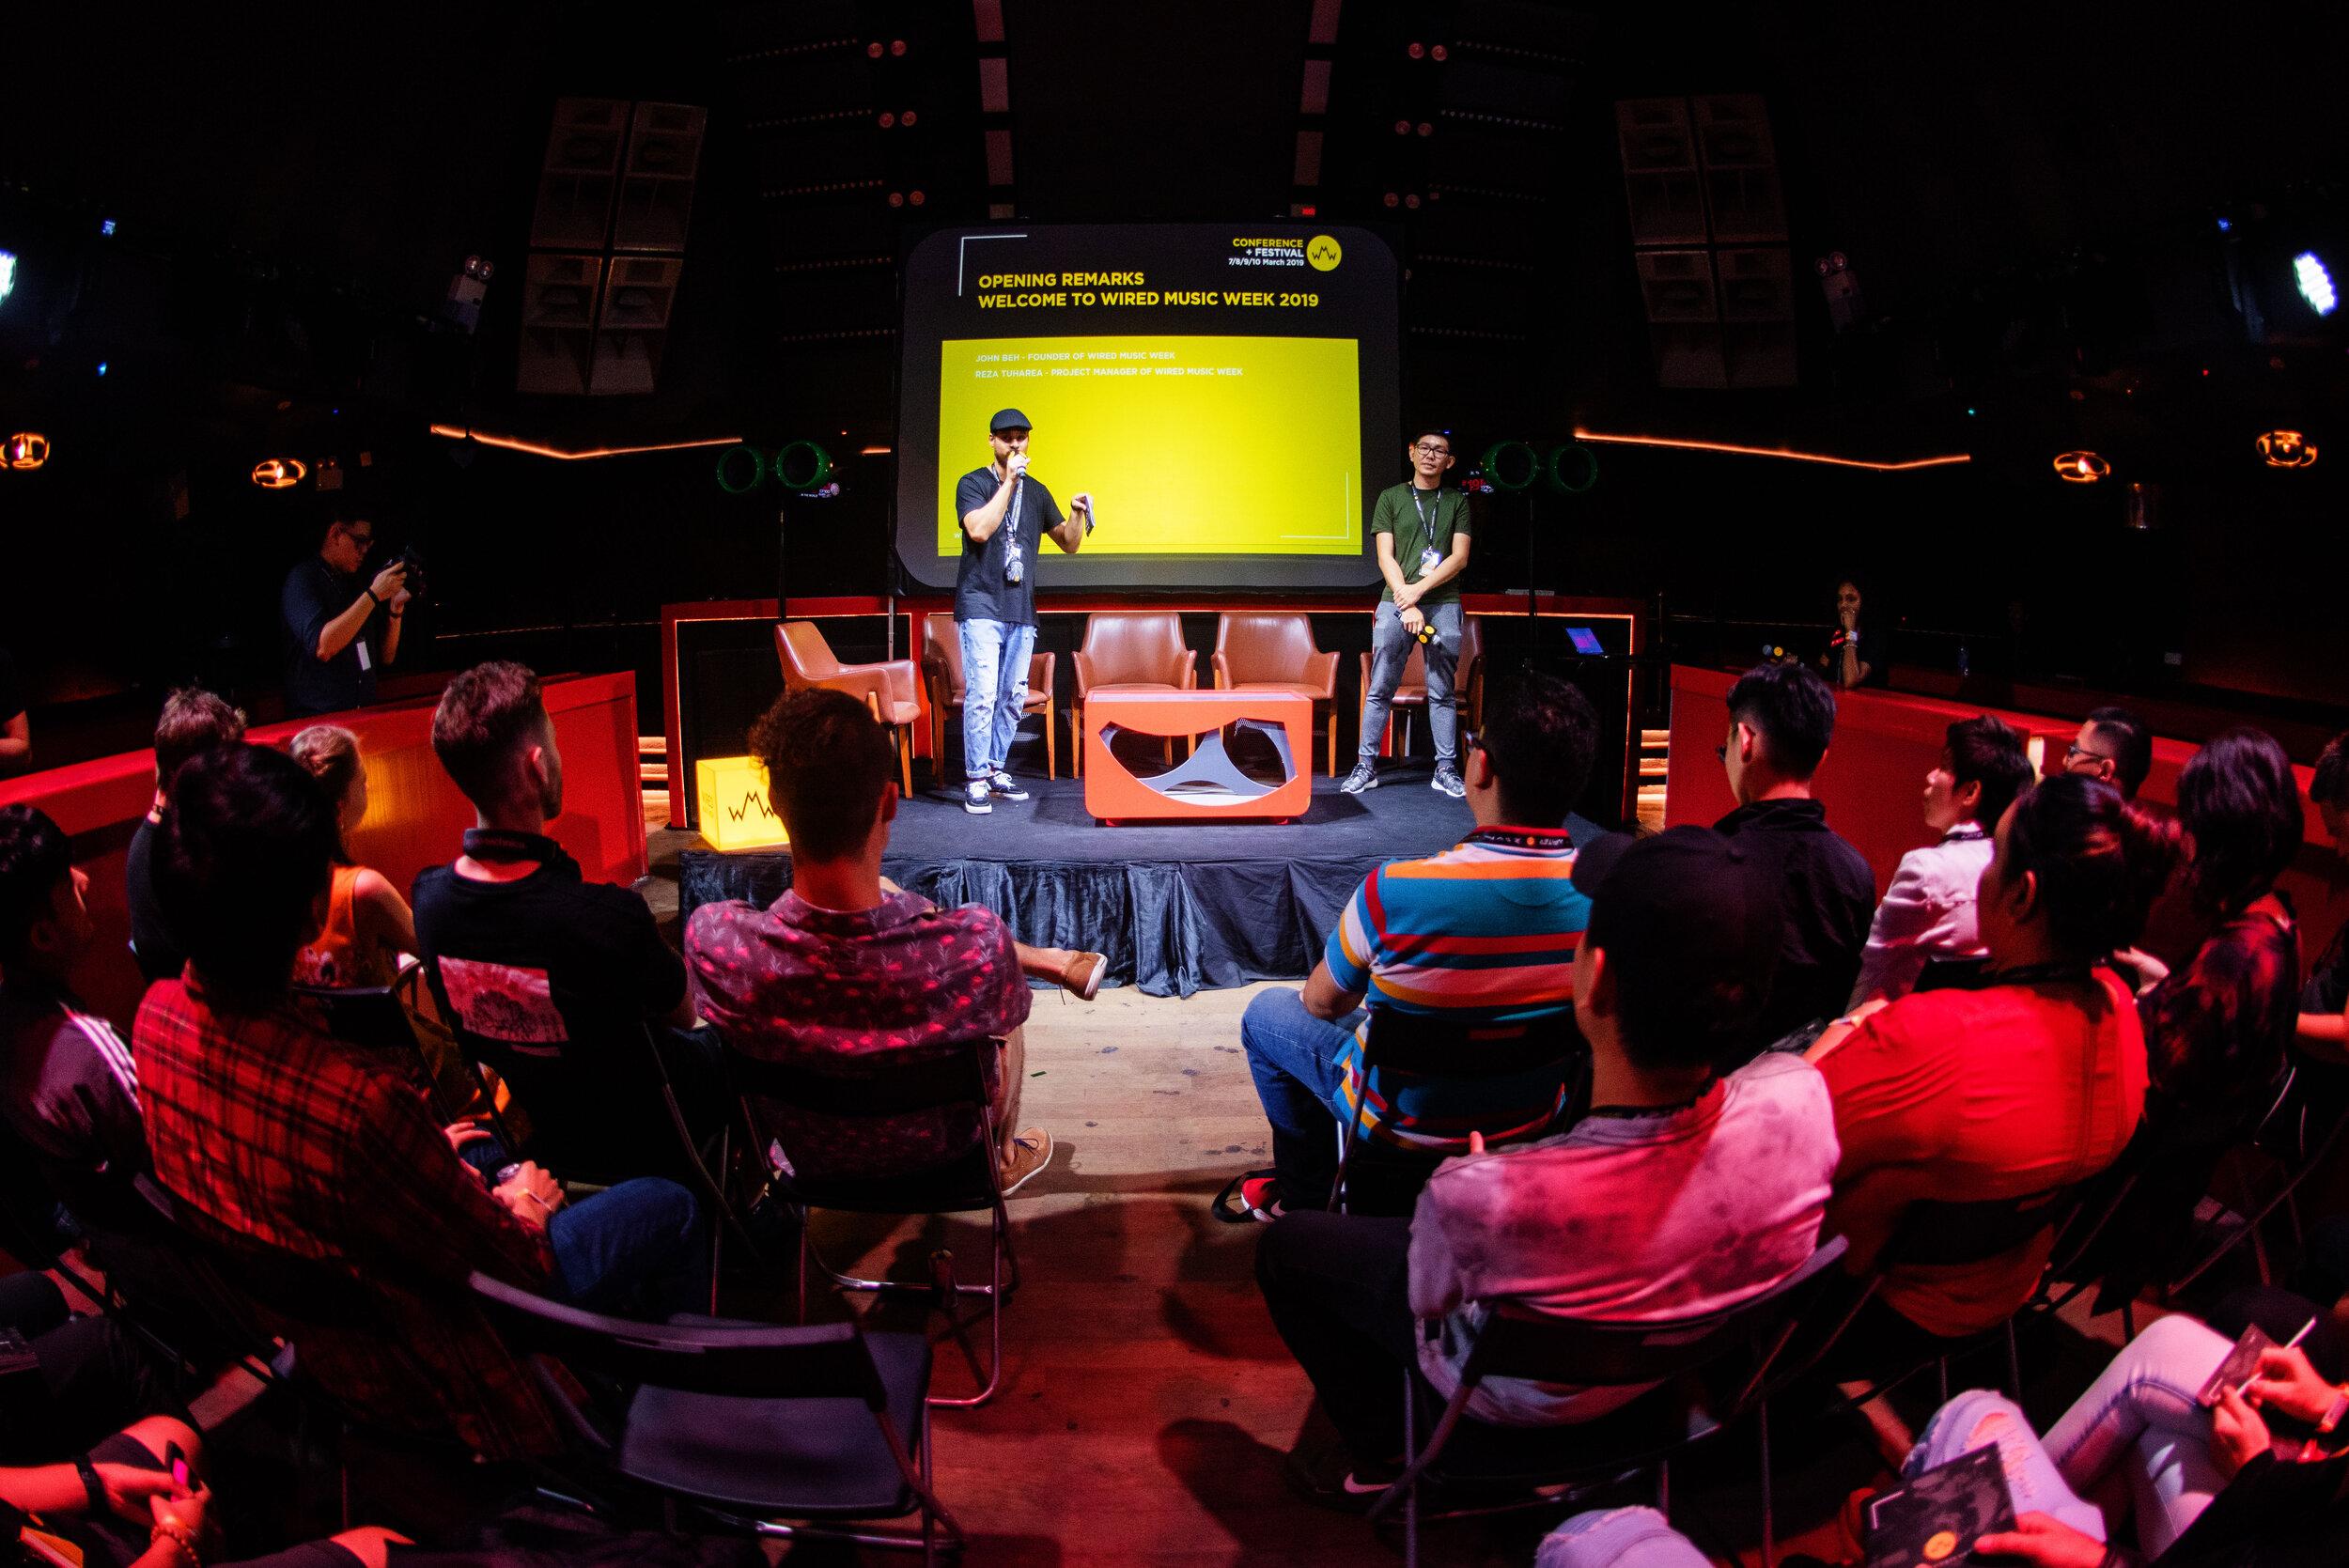 Wired Music Week Malaysia